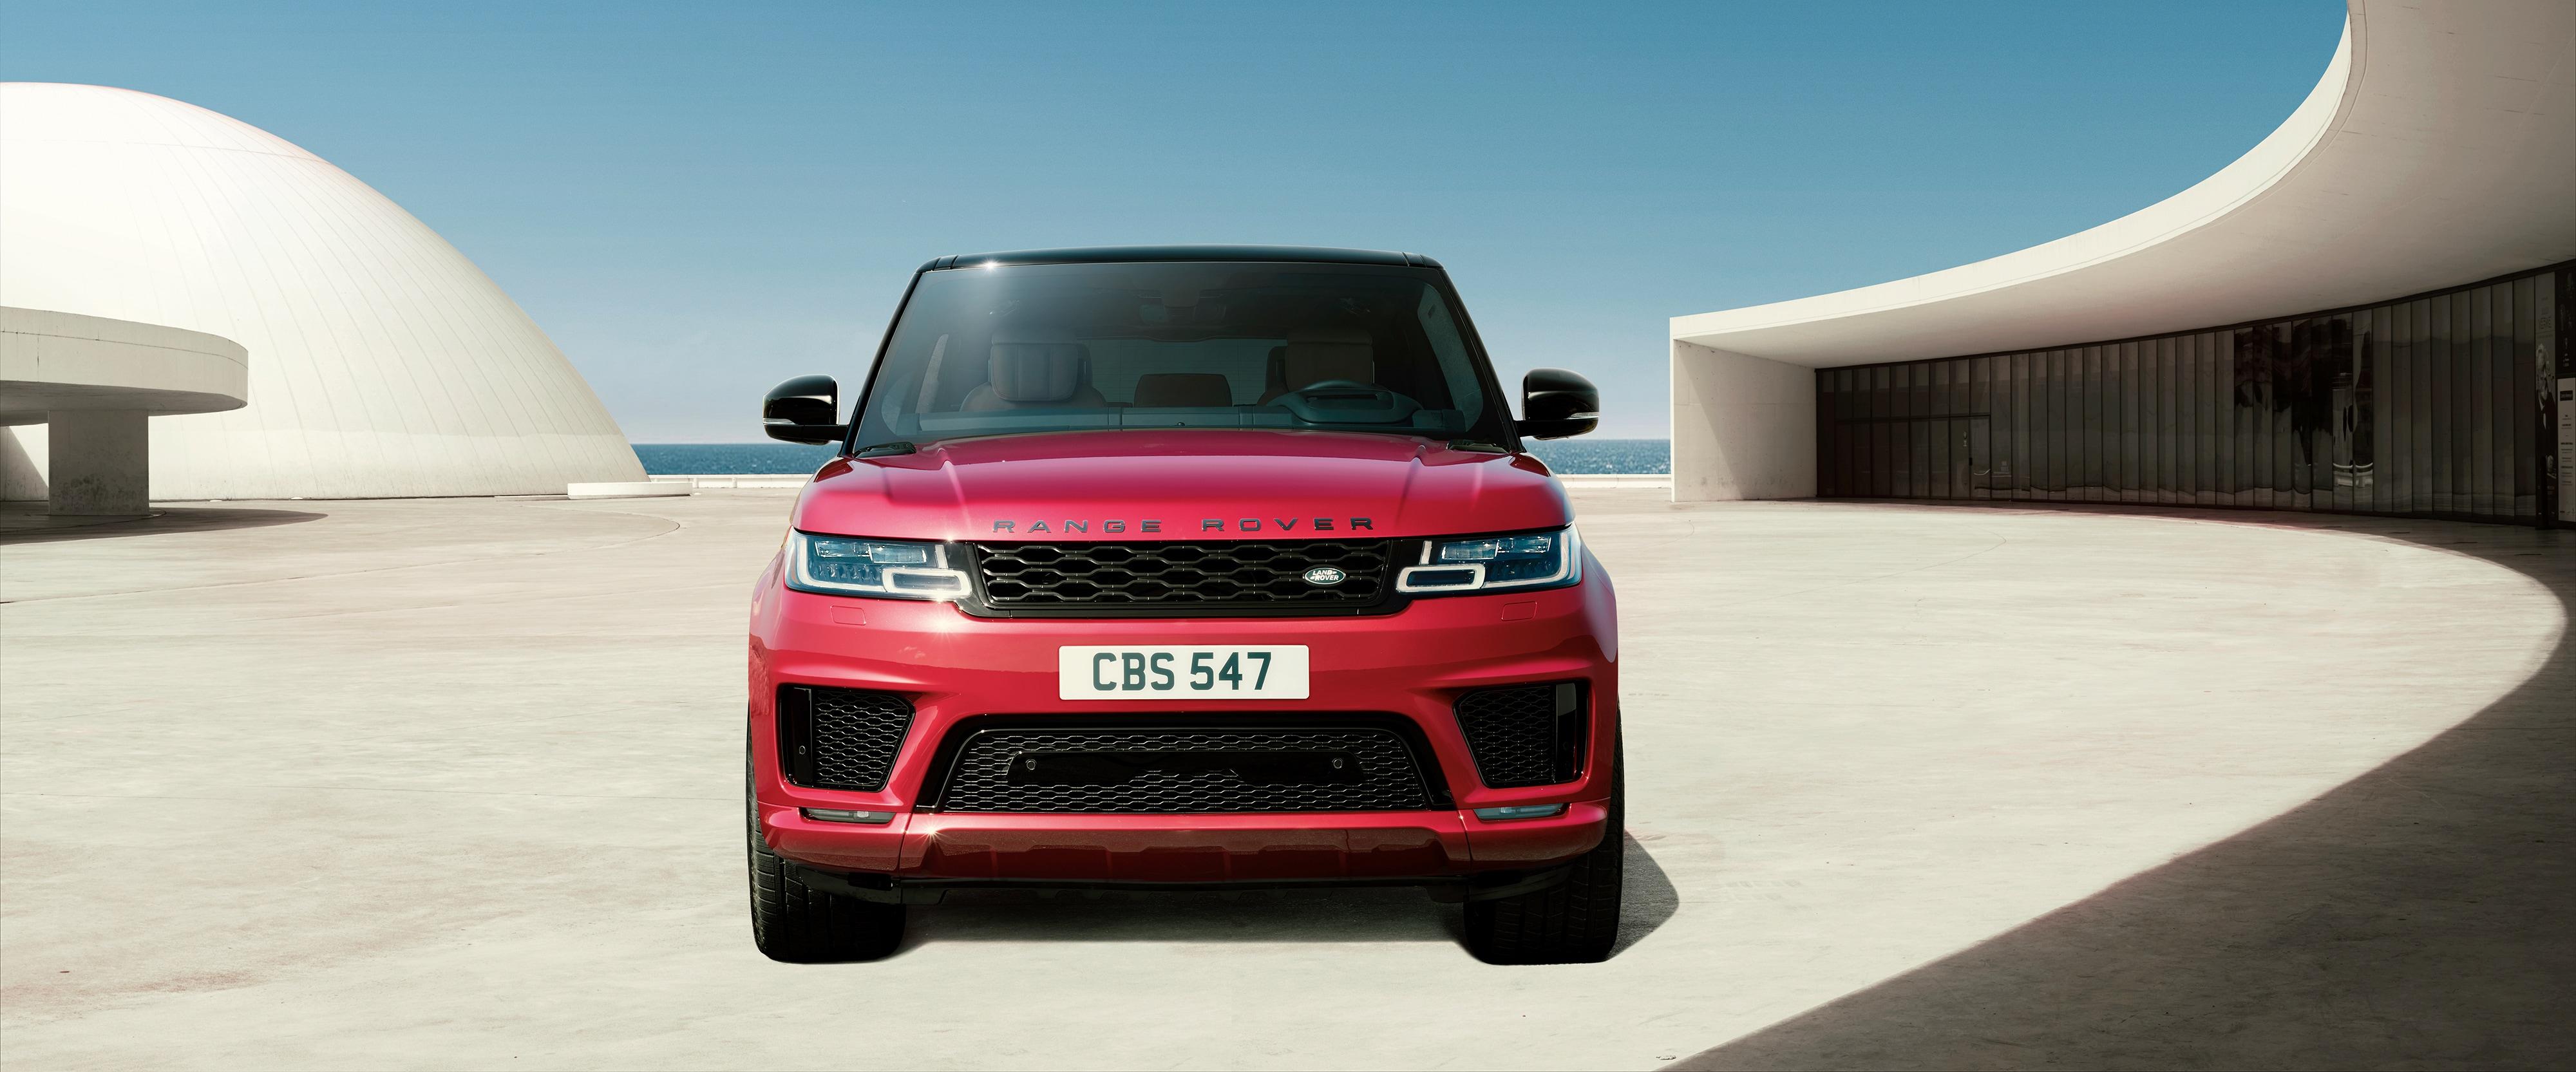 Range Rover Norwood >> 2020 Land Rover Range Rover SUVs Near Boston   Land Rover ...